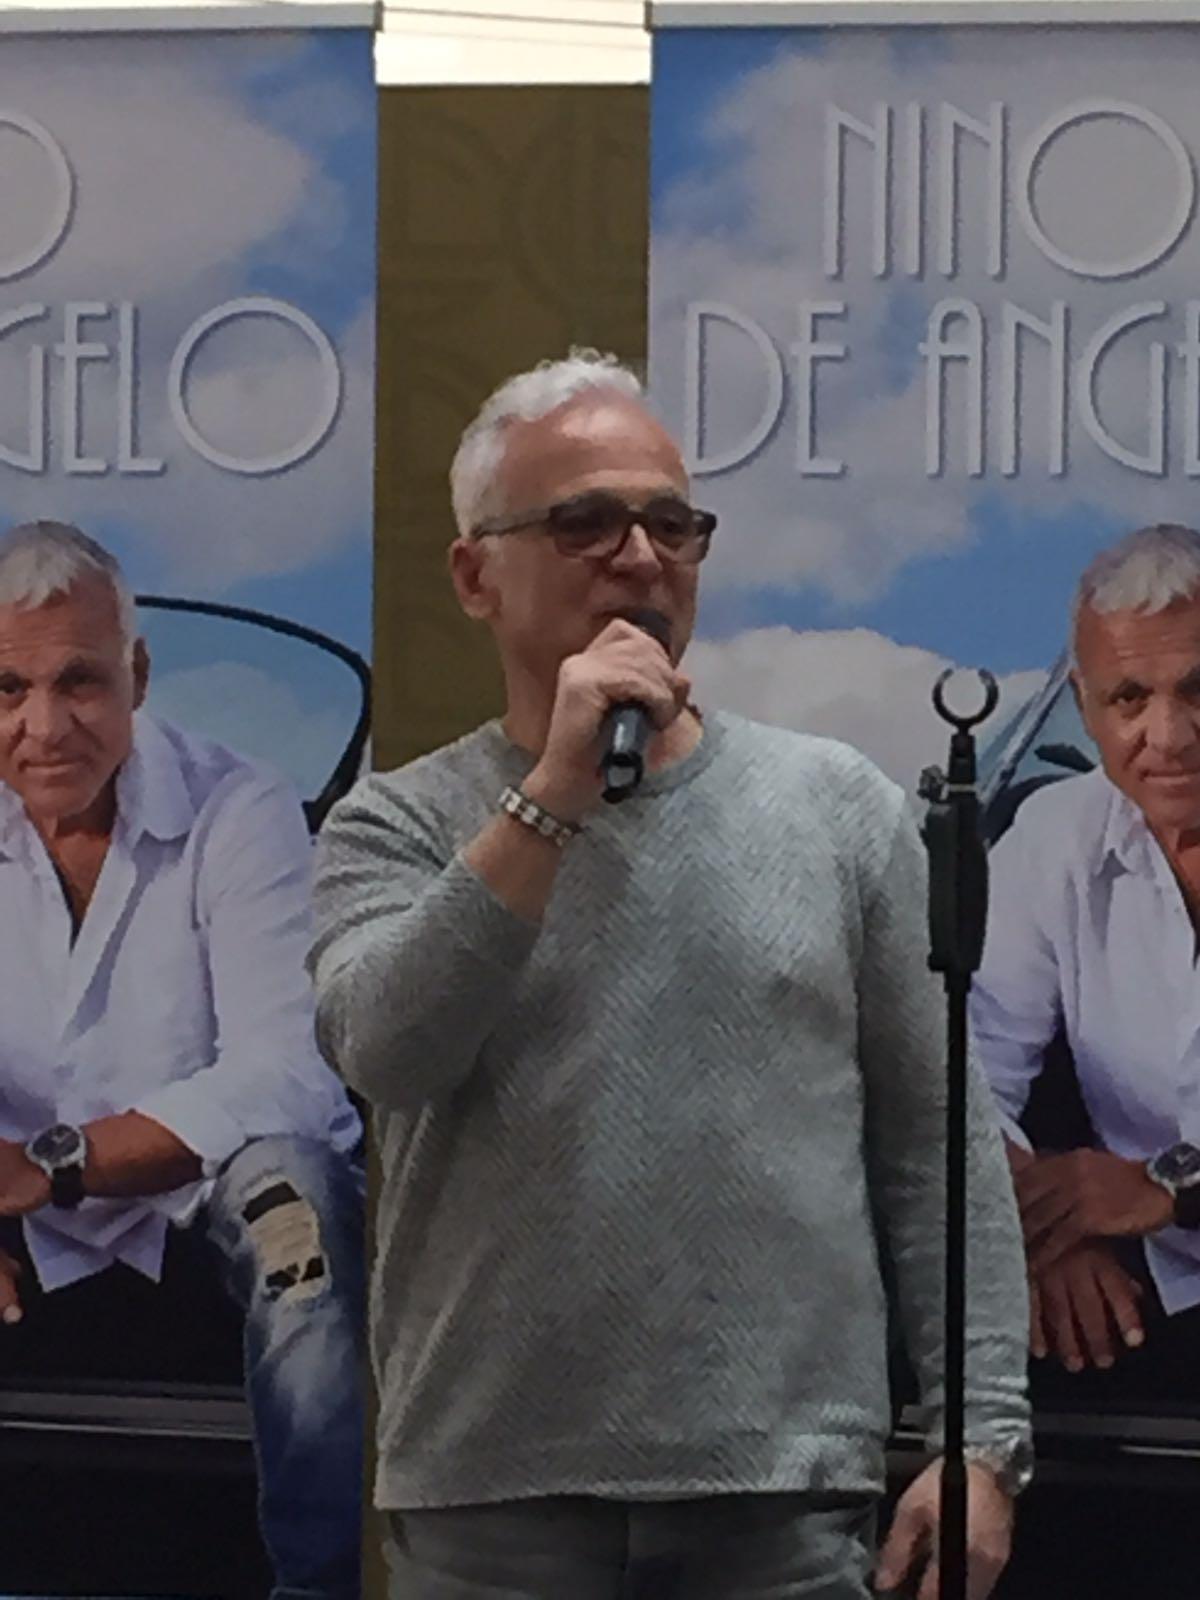 Autogramm Tournee Nino de Angelo